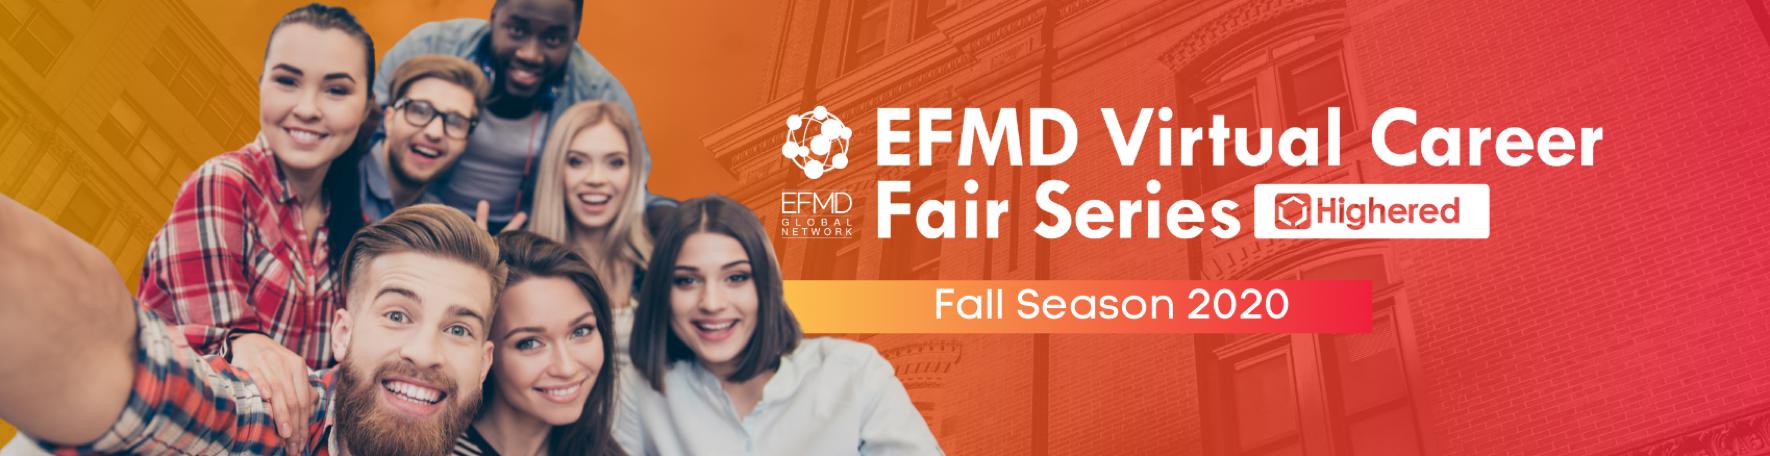 virtual_career_fall_event